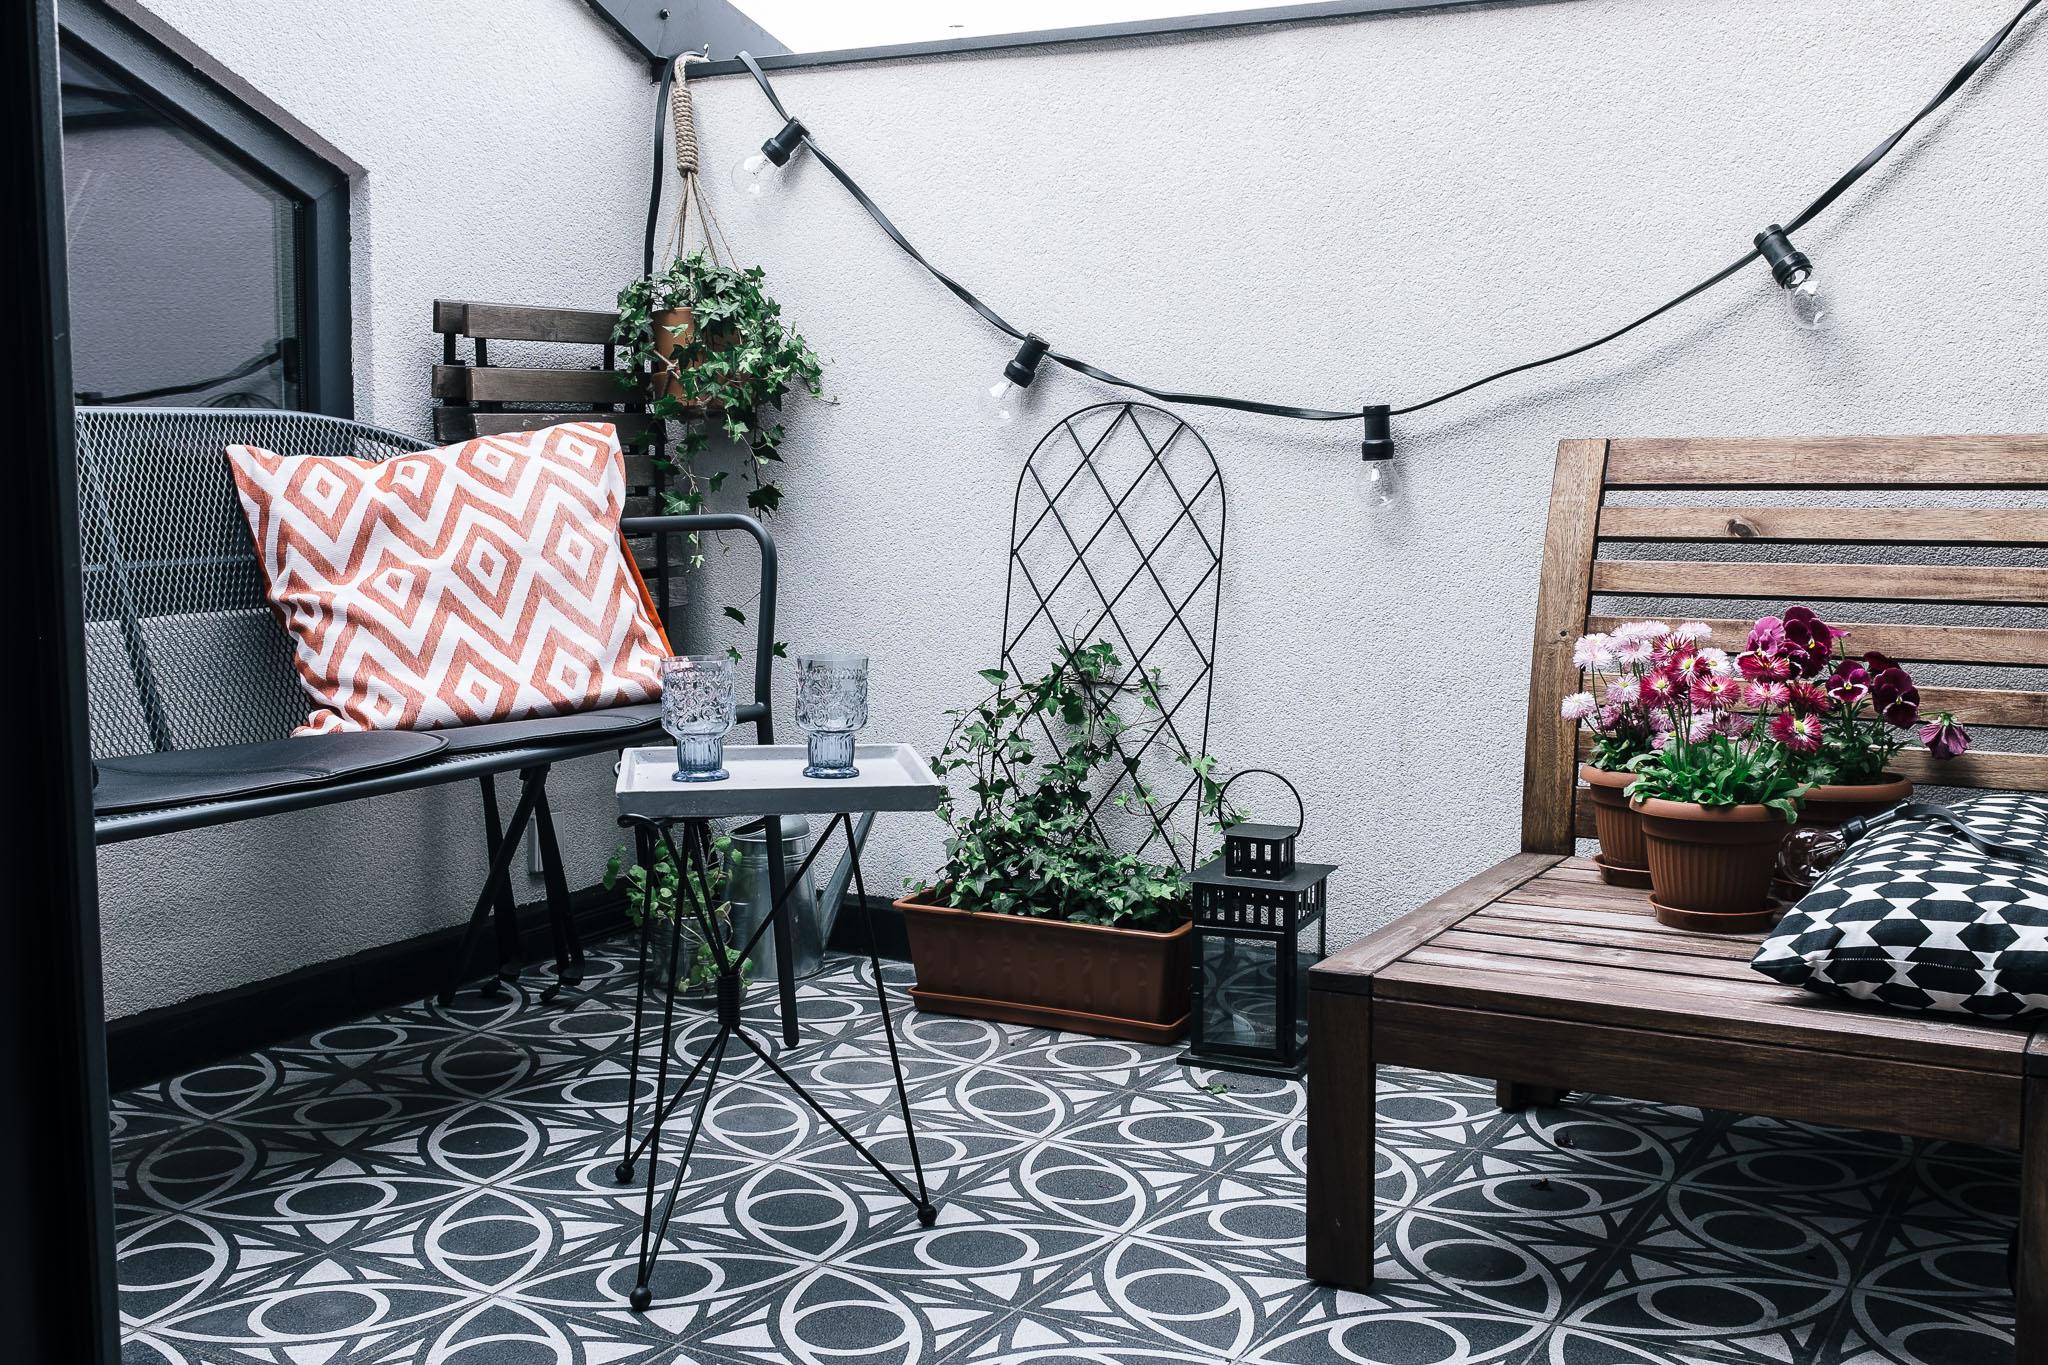 klein balkon met patroontegels inrichting. Black Bedroom Furniture Sets. Home Design Ideas